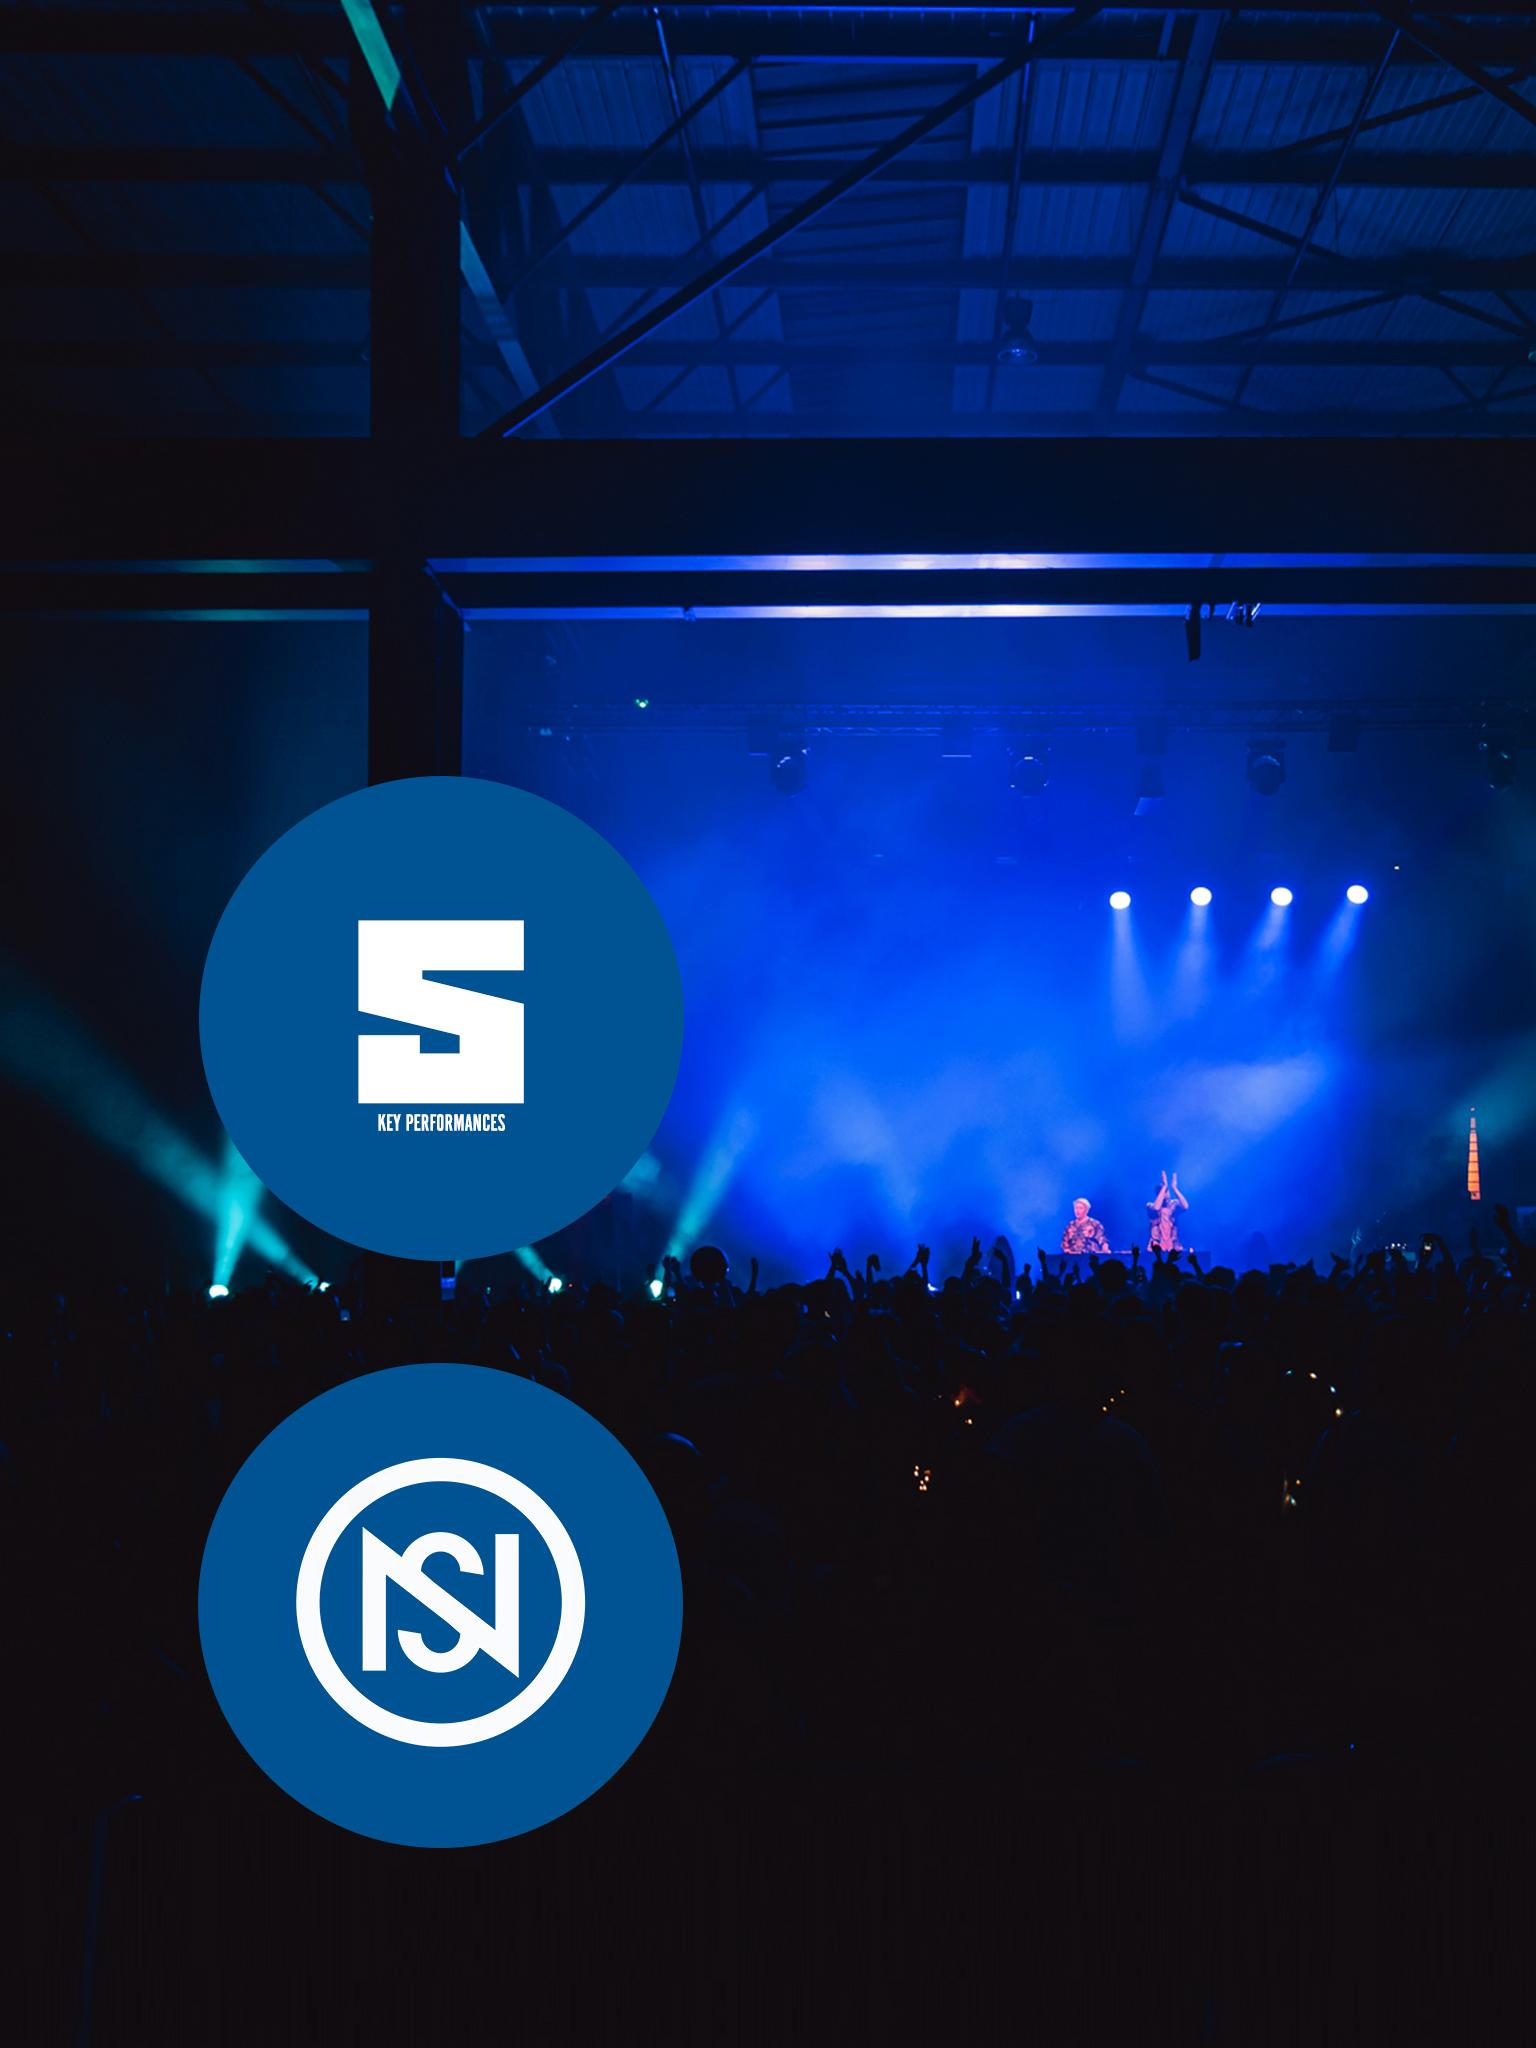 Five Key Performances: Nuits Sonores 2021